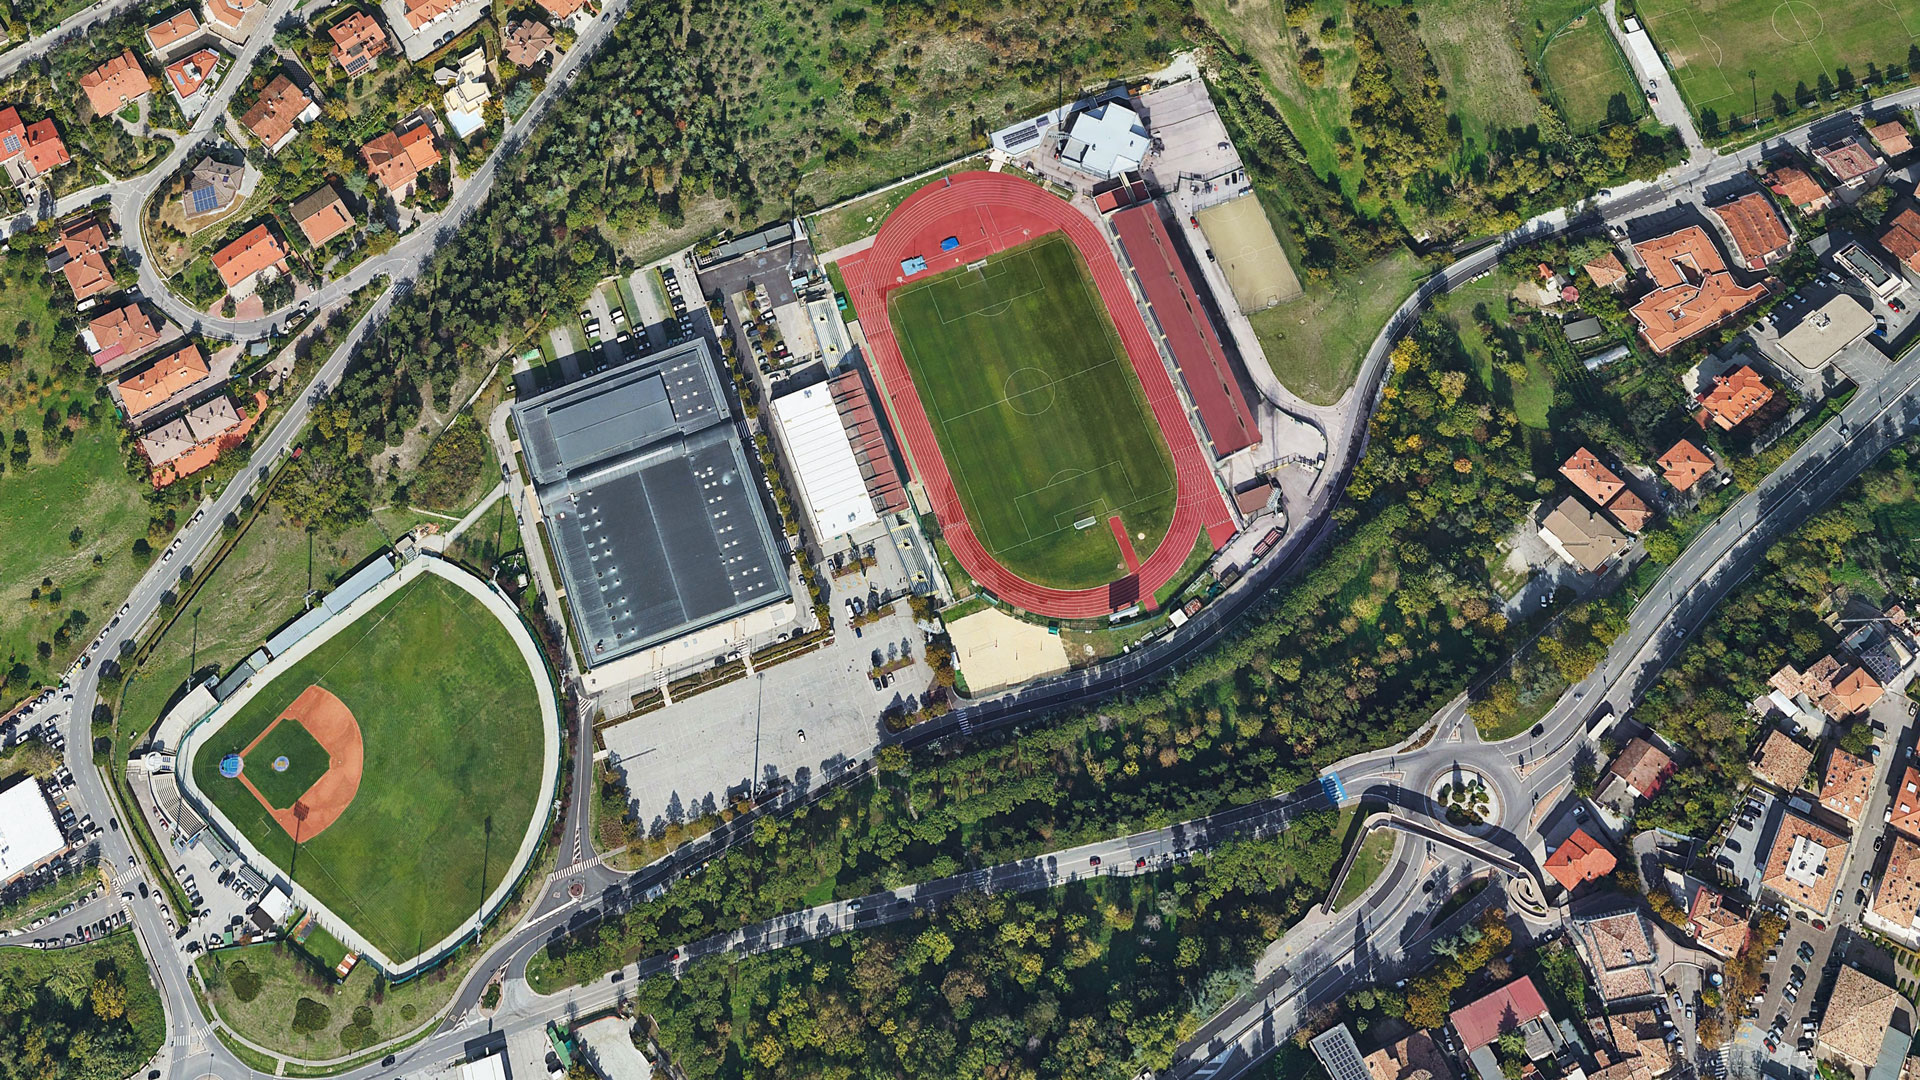 San-marino-stadium